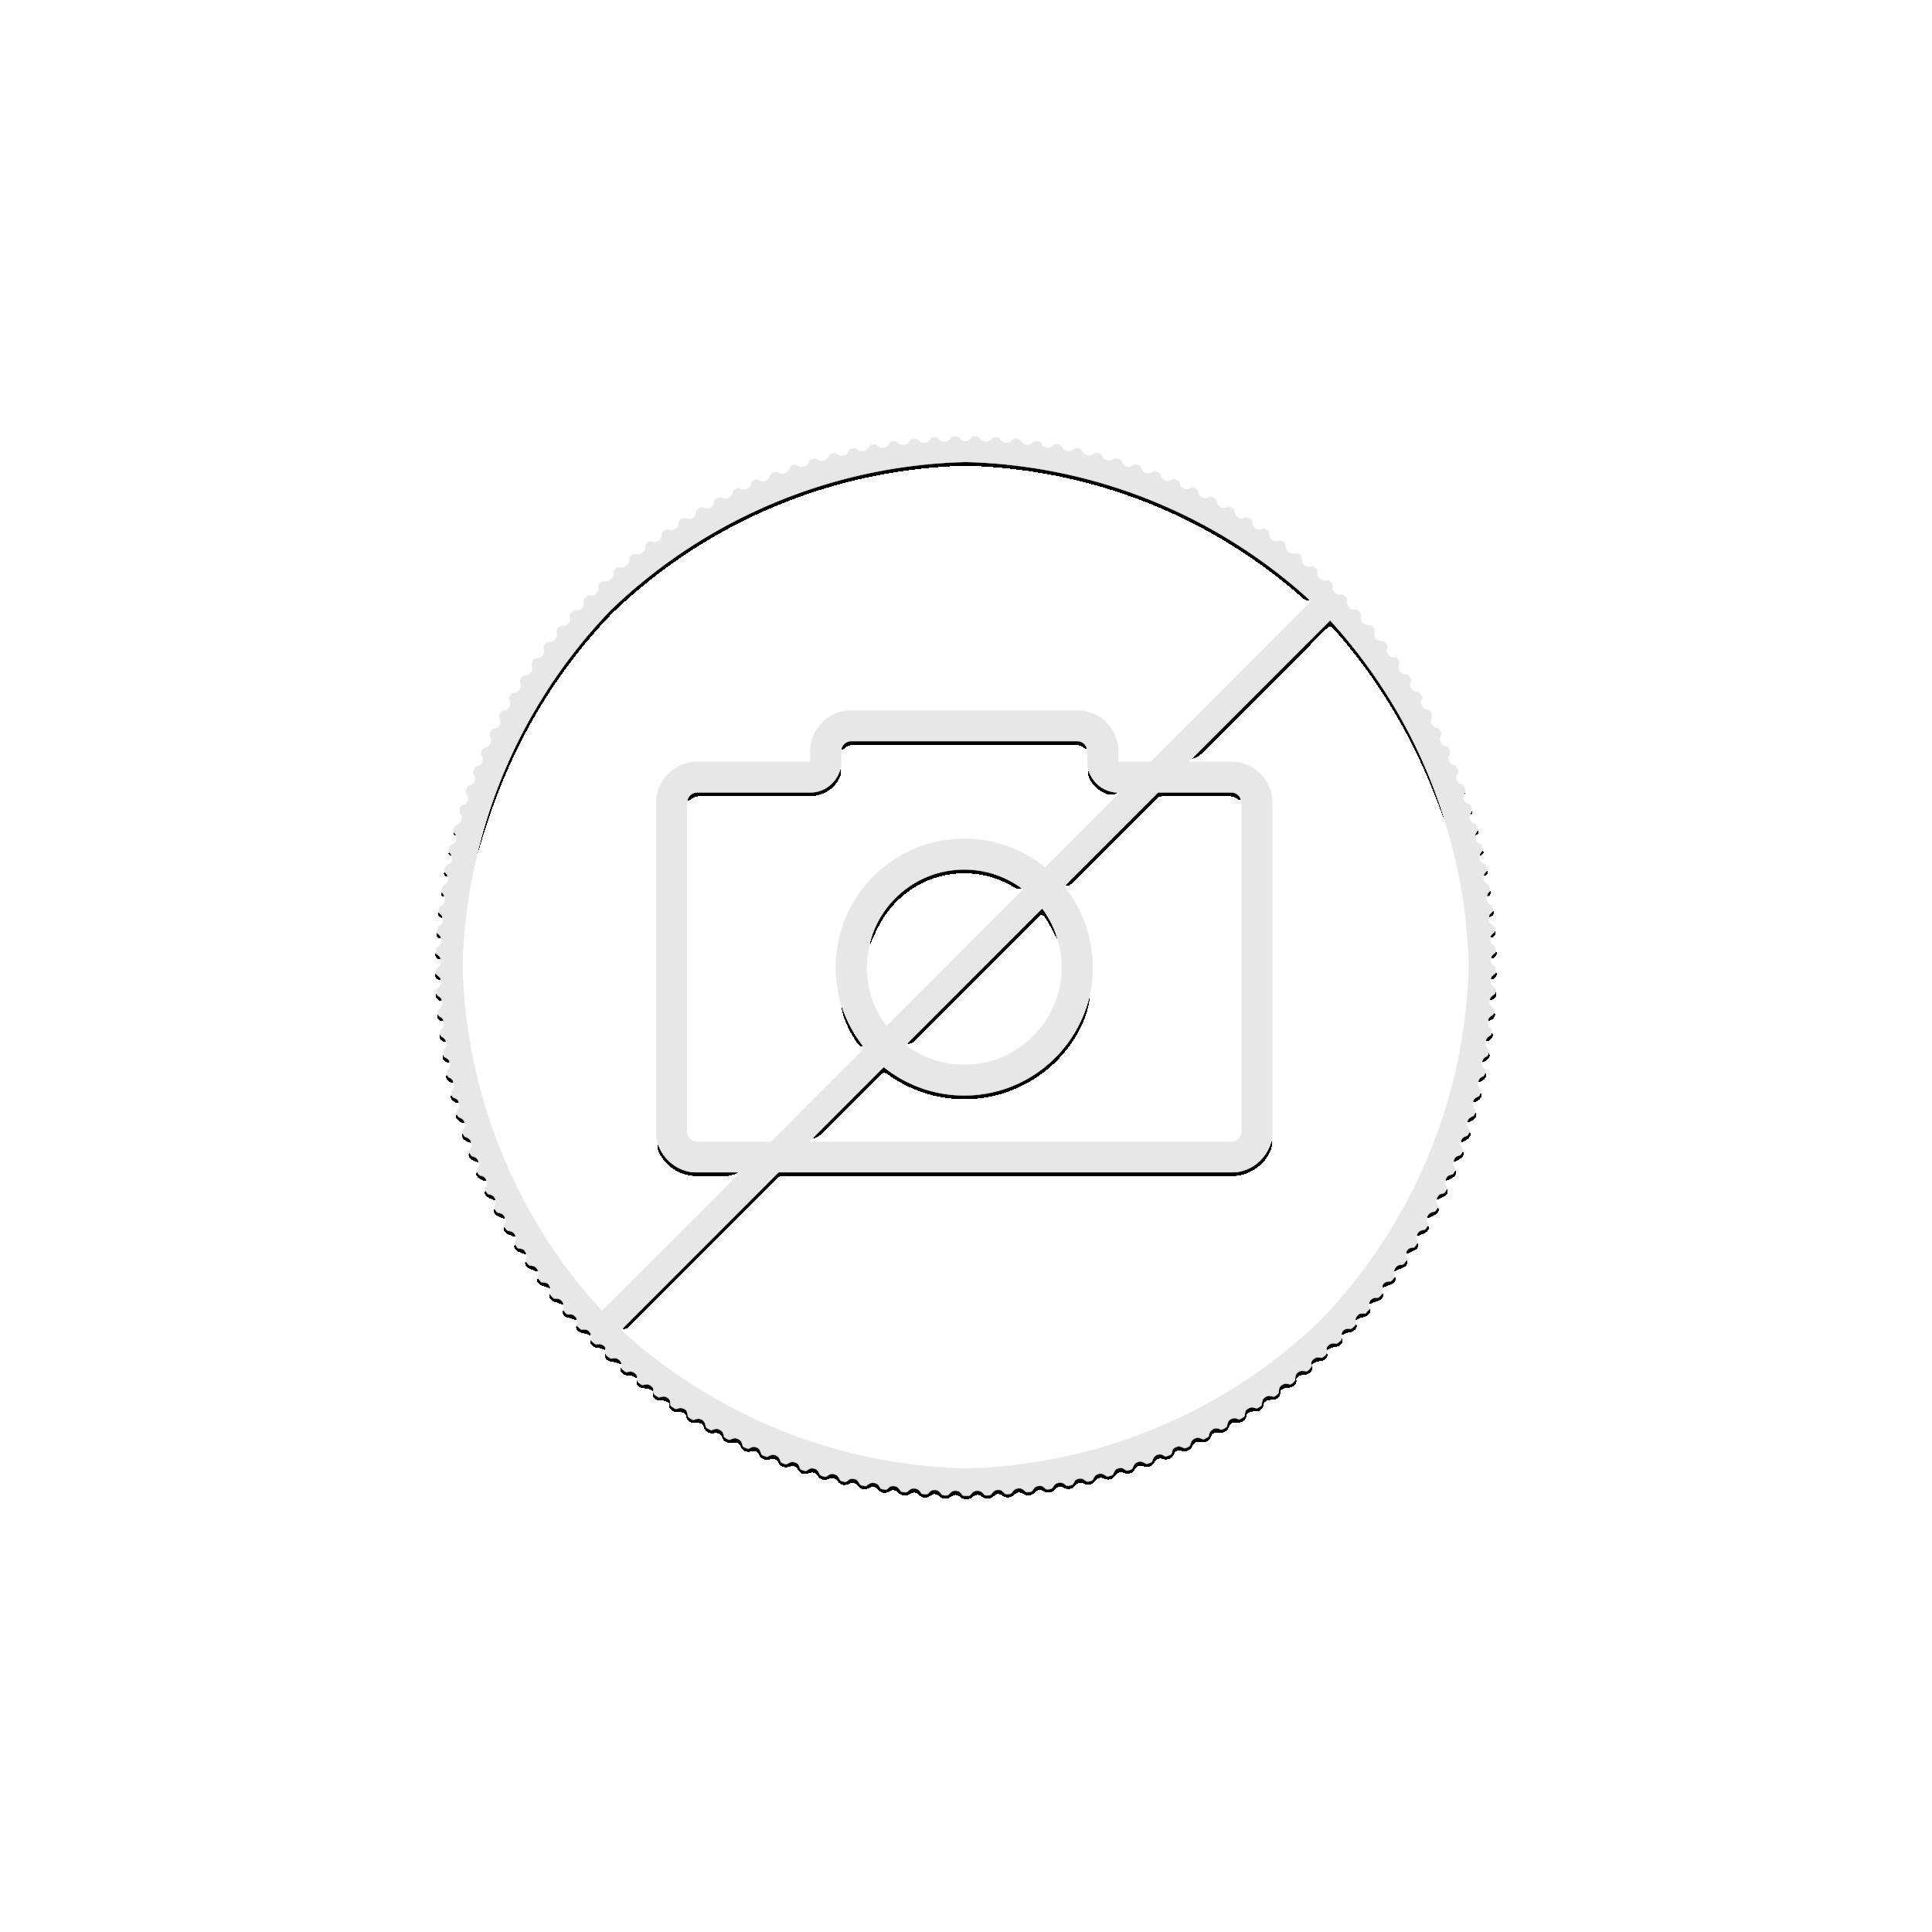 1 Troy ounce zilveren munt Maple Leaf 2016 Antique Finish